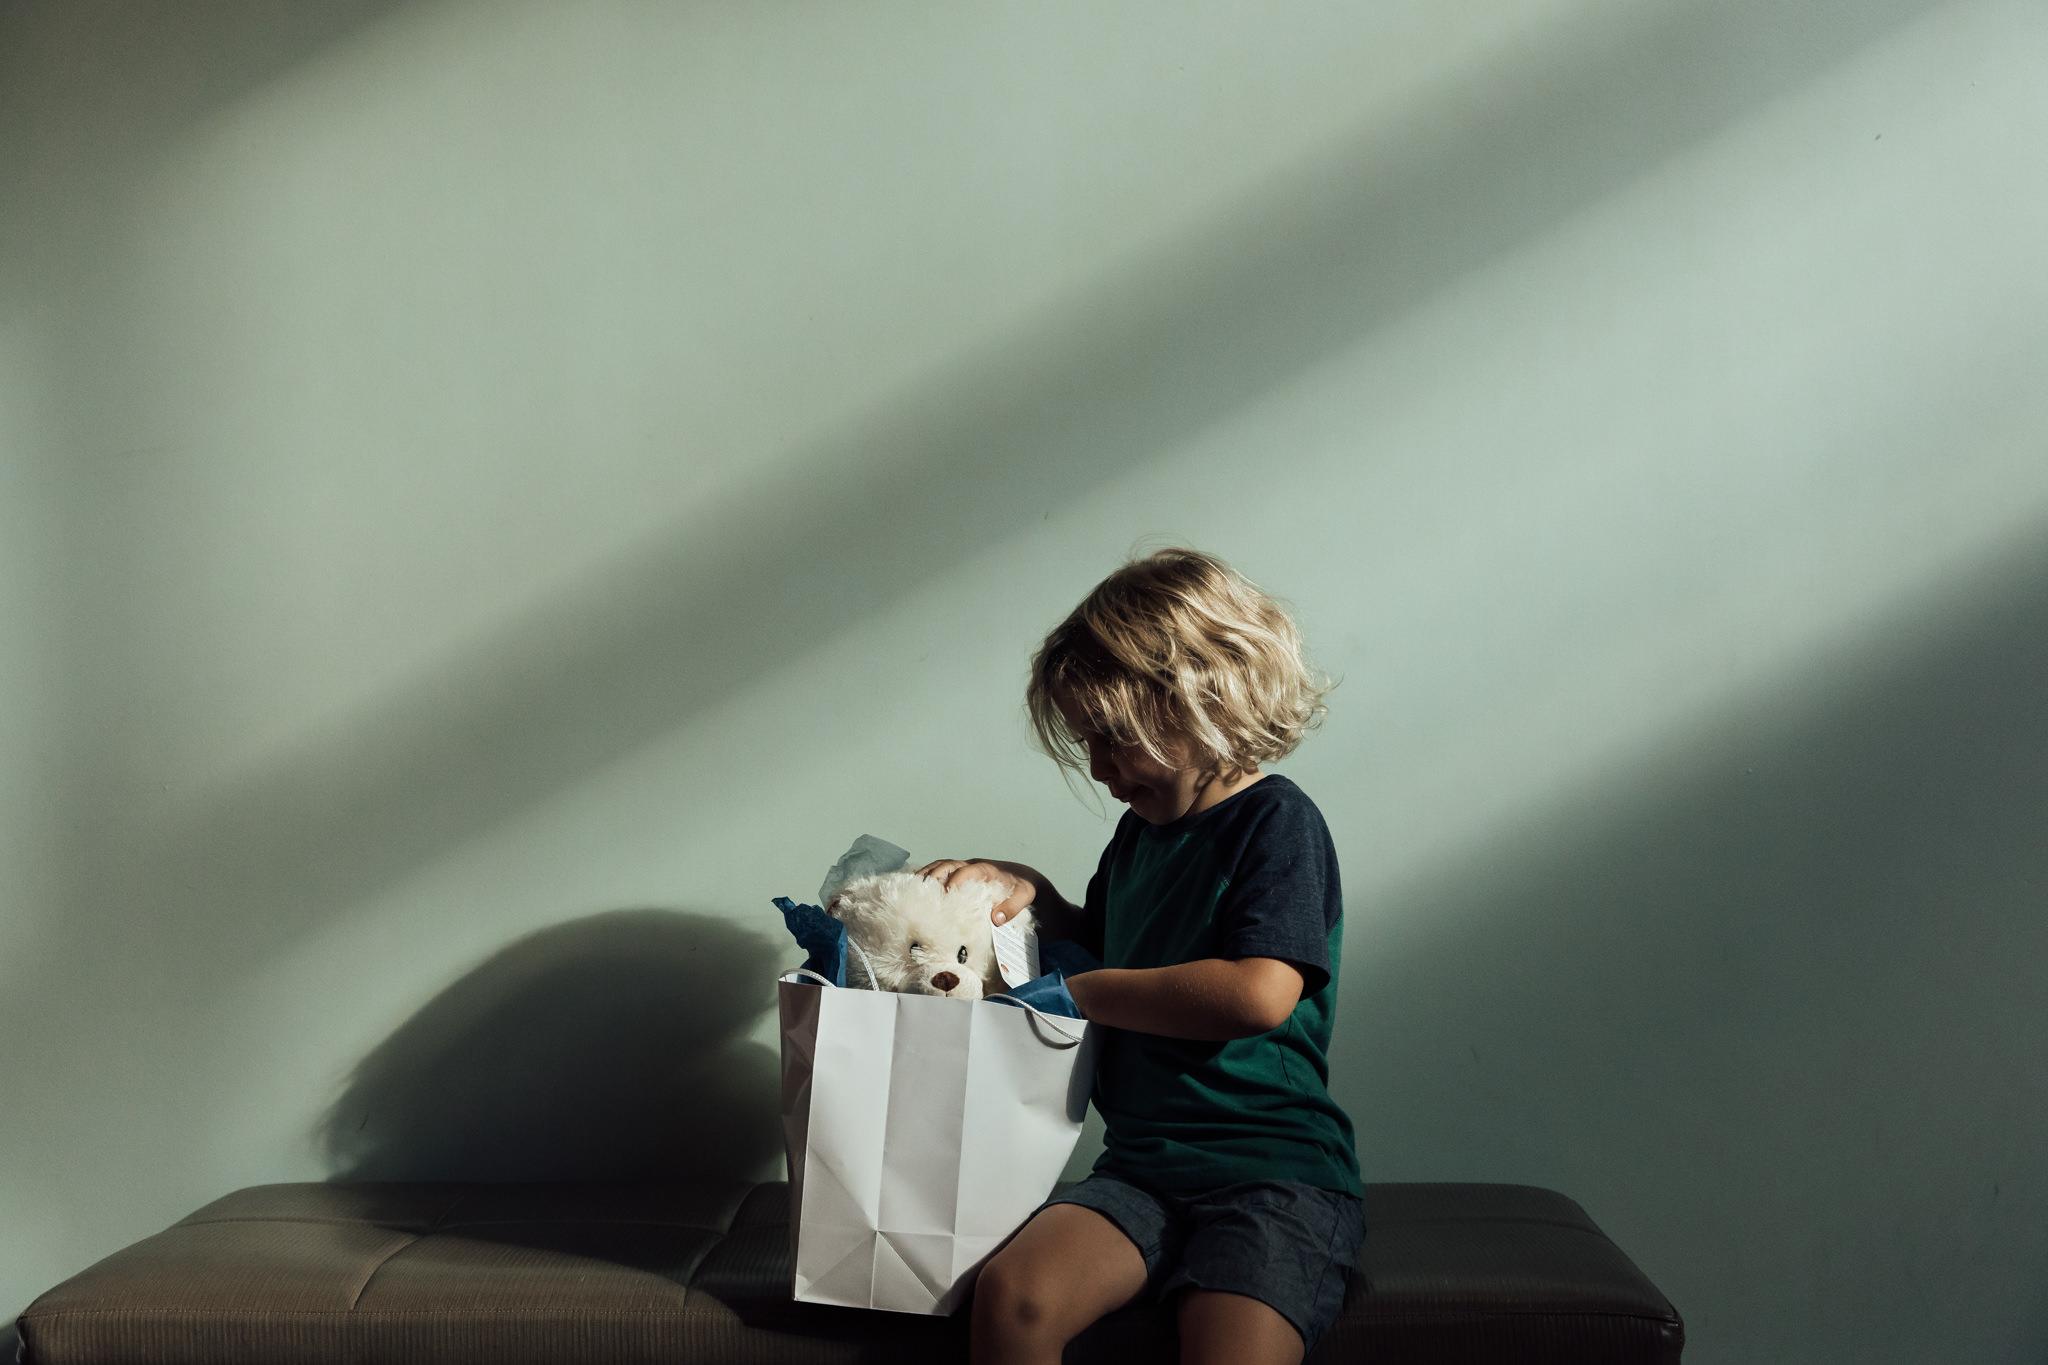 birth-photography-documentary-family-photographer-136.jpg